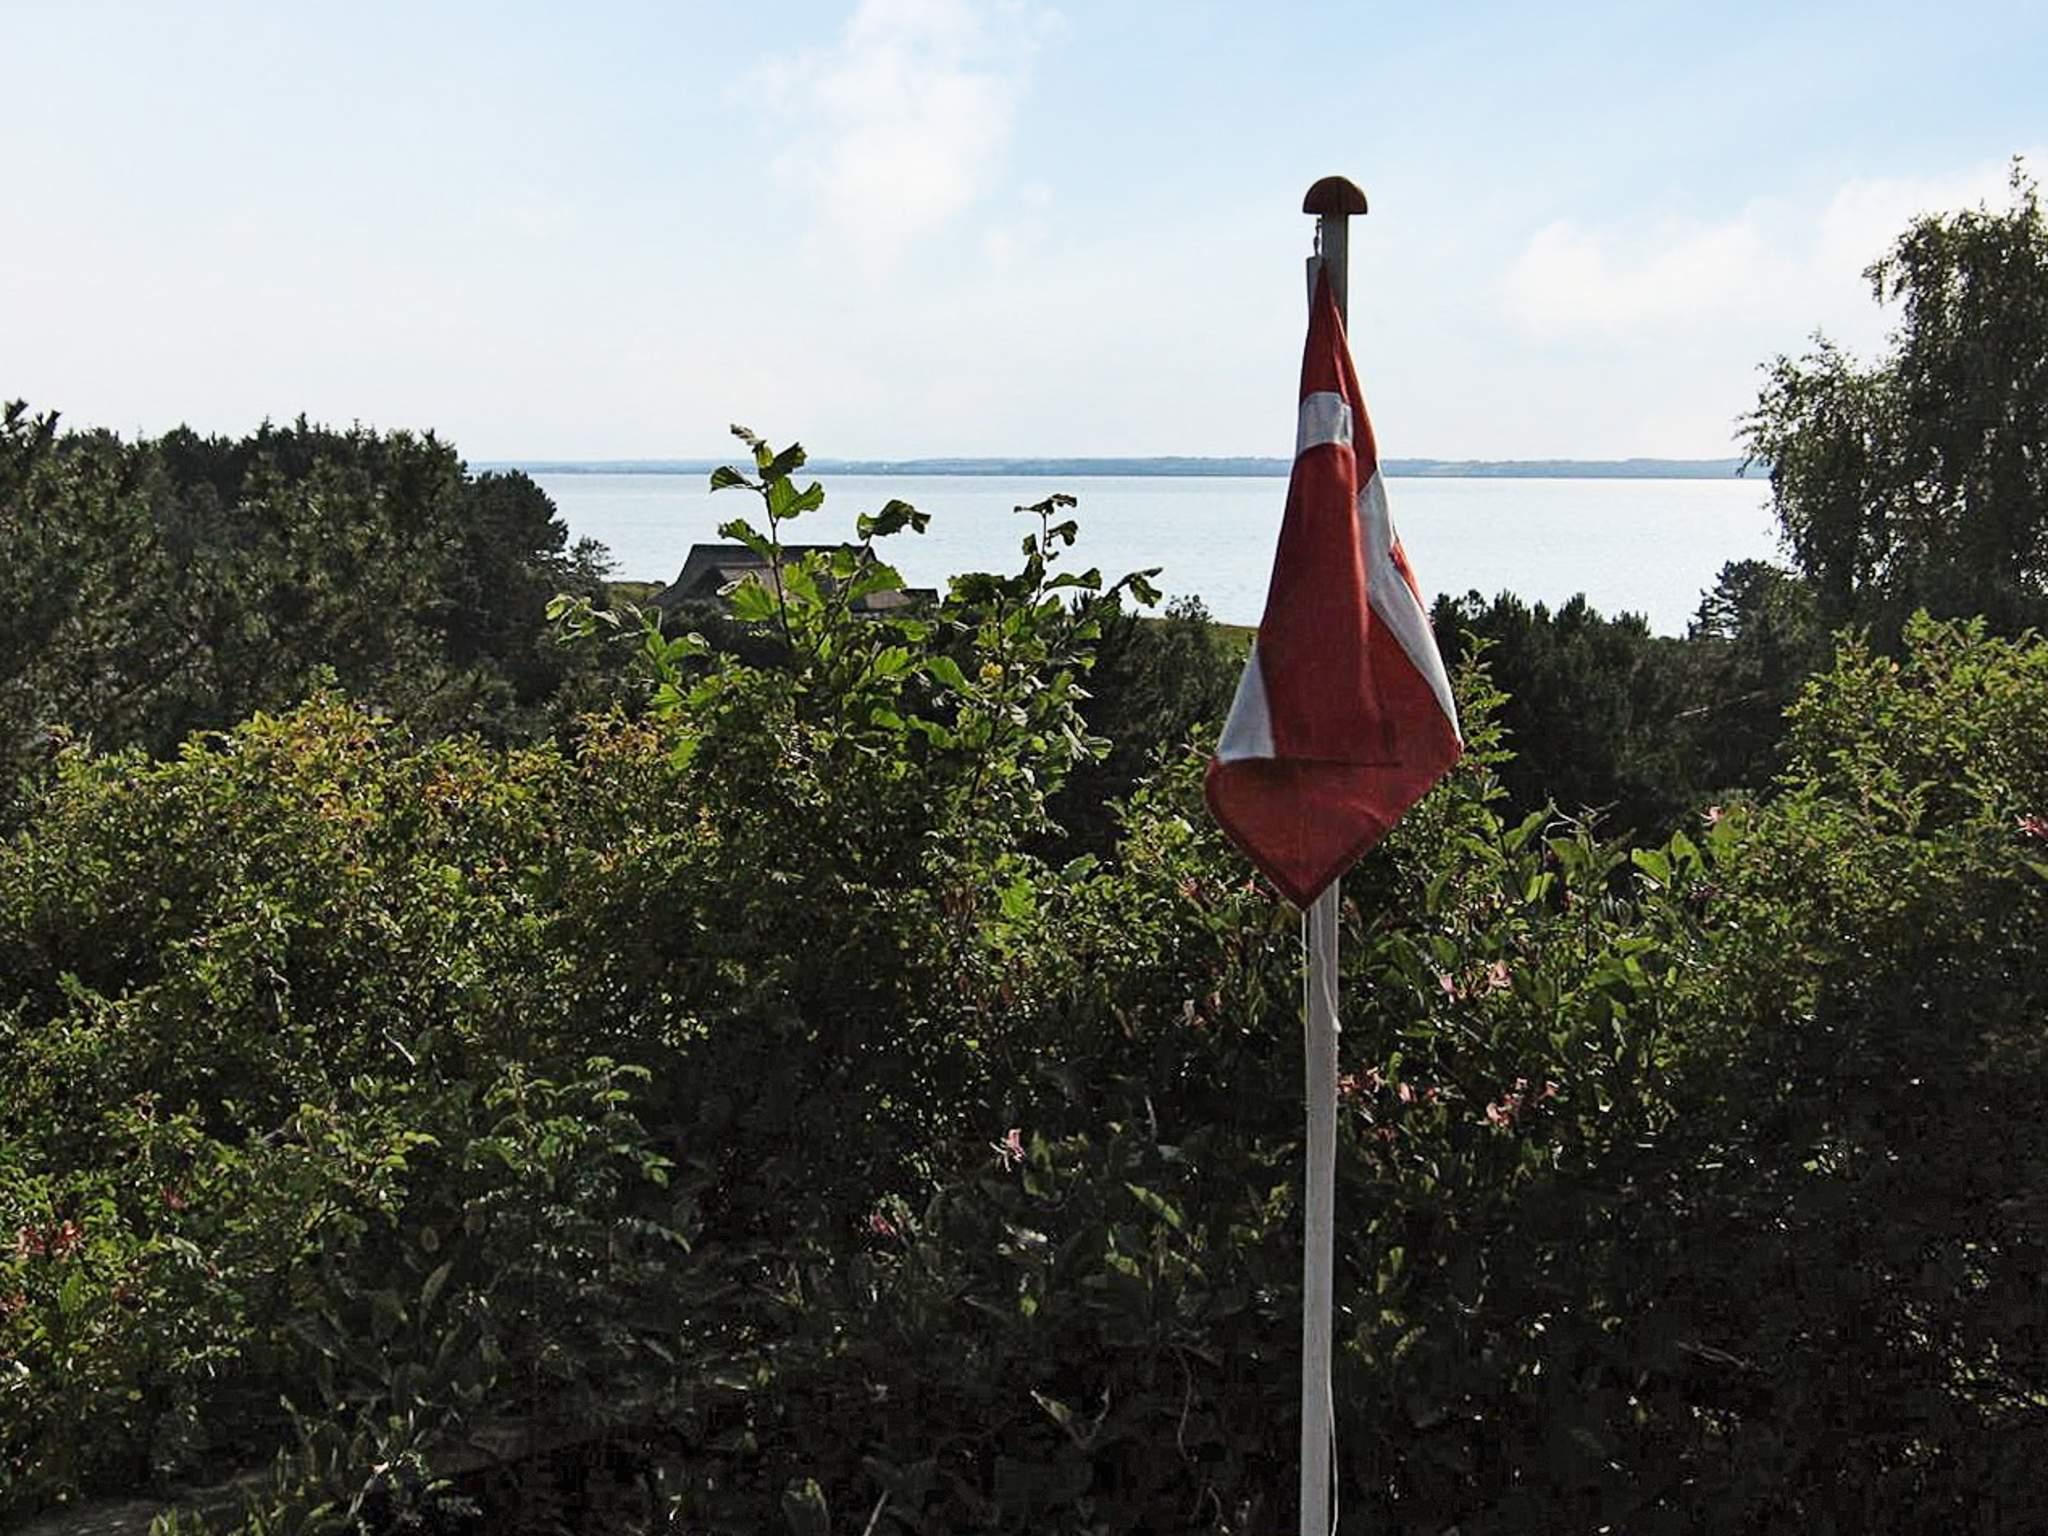 Maison de vacances Helgenæs (921415), Knebel, , Jutland Est, Danemark, image 15